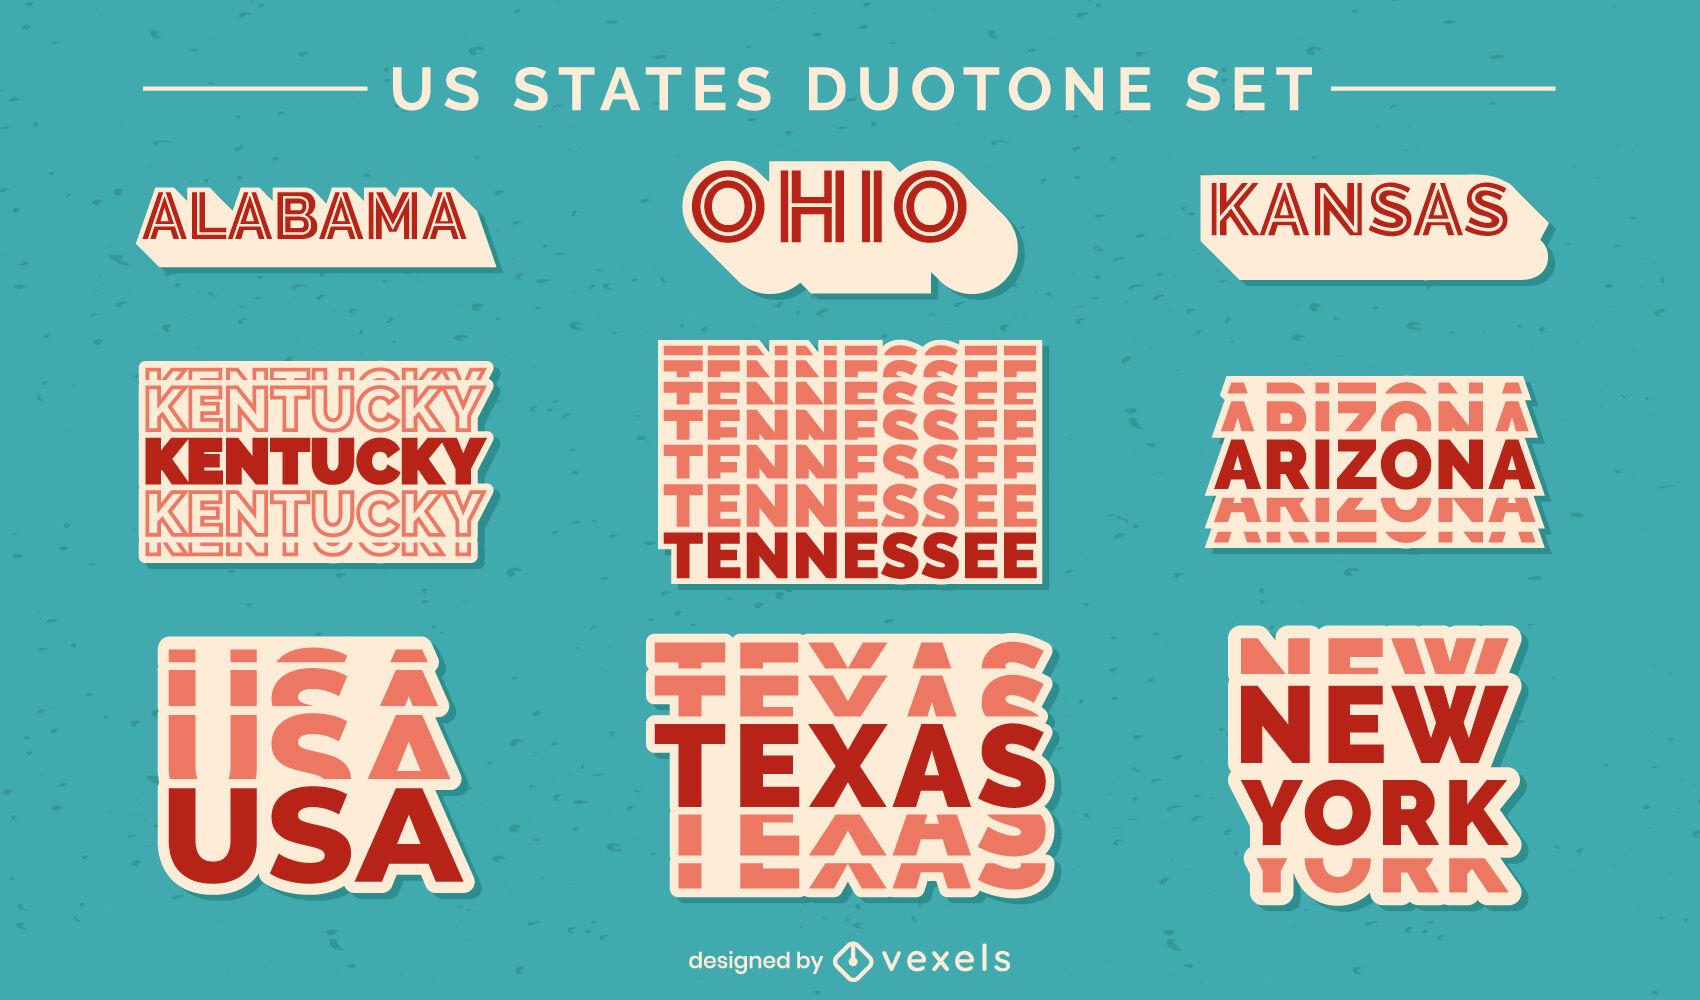 US states duotone lettering set